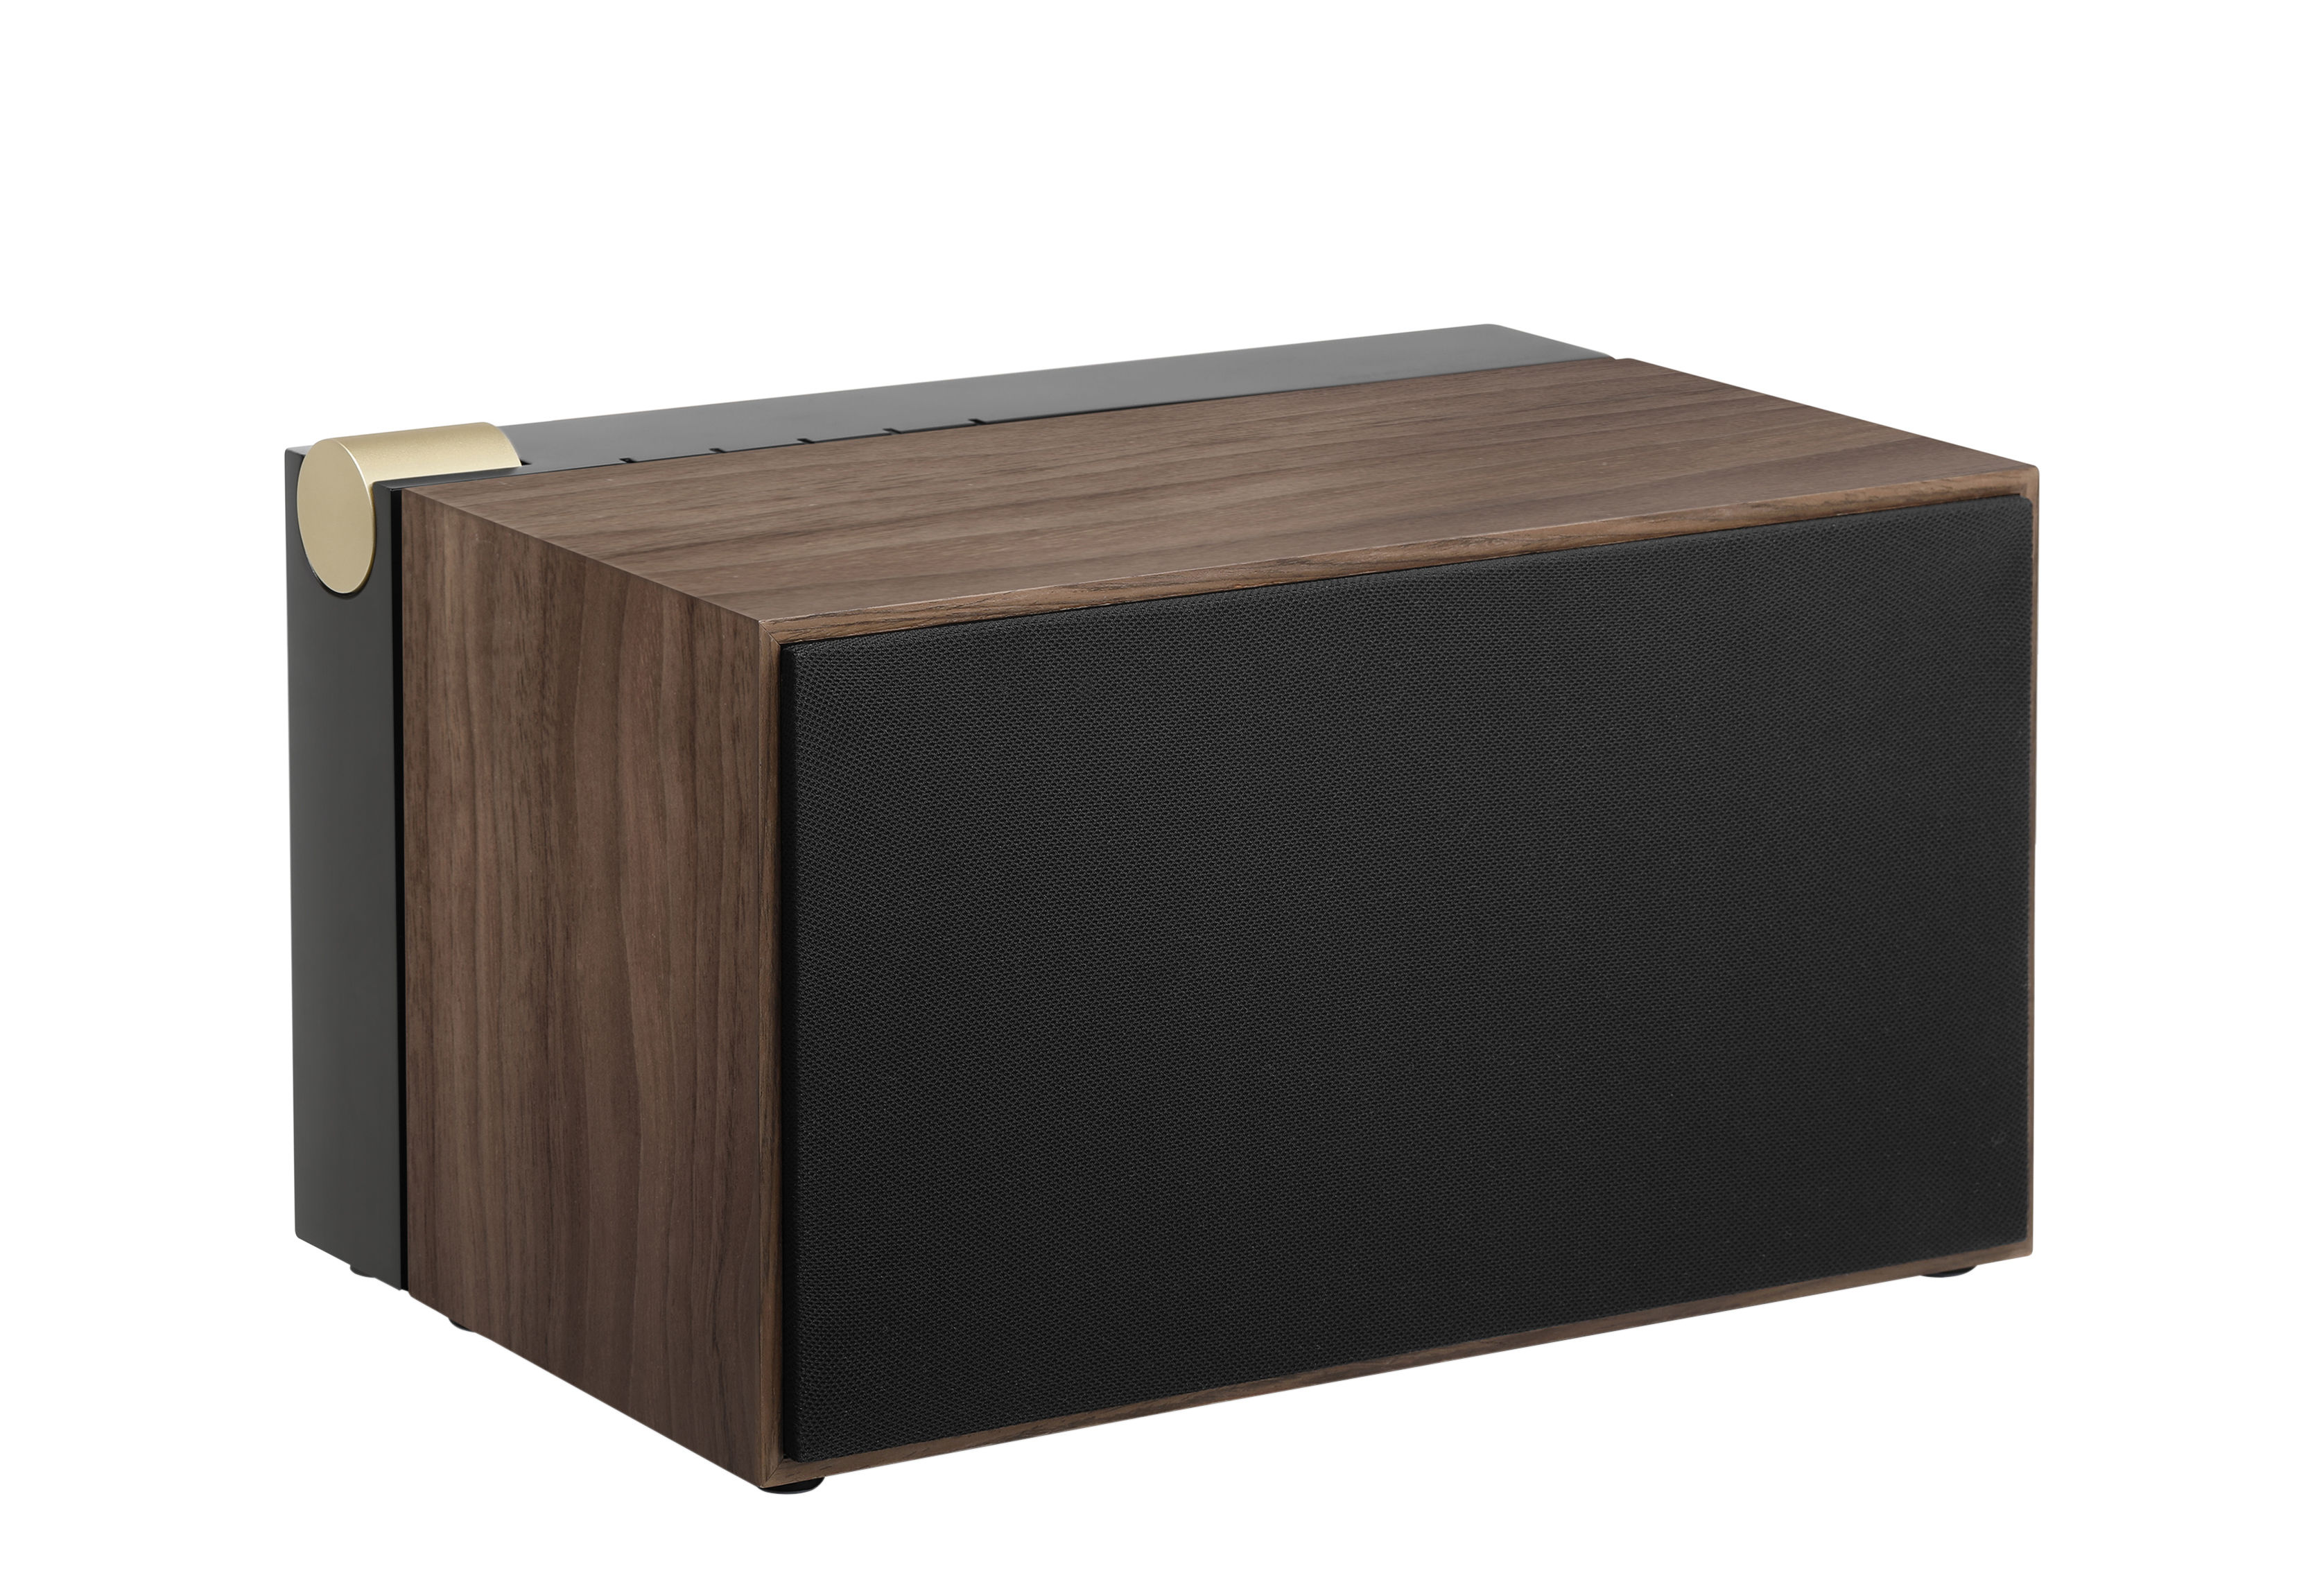 Dossiers - St-Valentin - Enceinte Bluetooth PR 01 / Avec technologie Active Pression Reflex - La Boîte Concept - Noir & noyer - Aluminium, Bois multiplis, MDF, Noyer naturel, Tissu